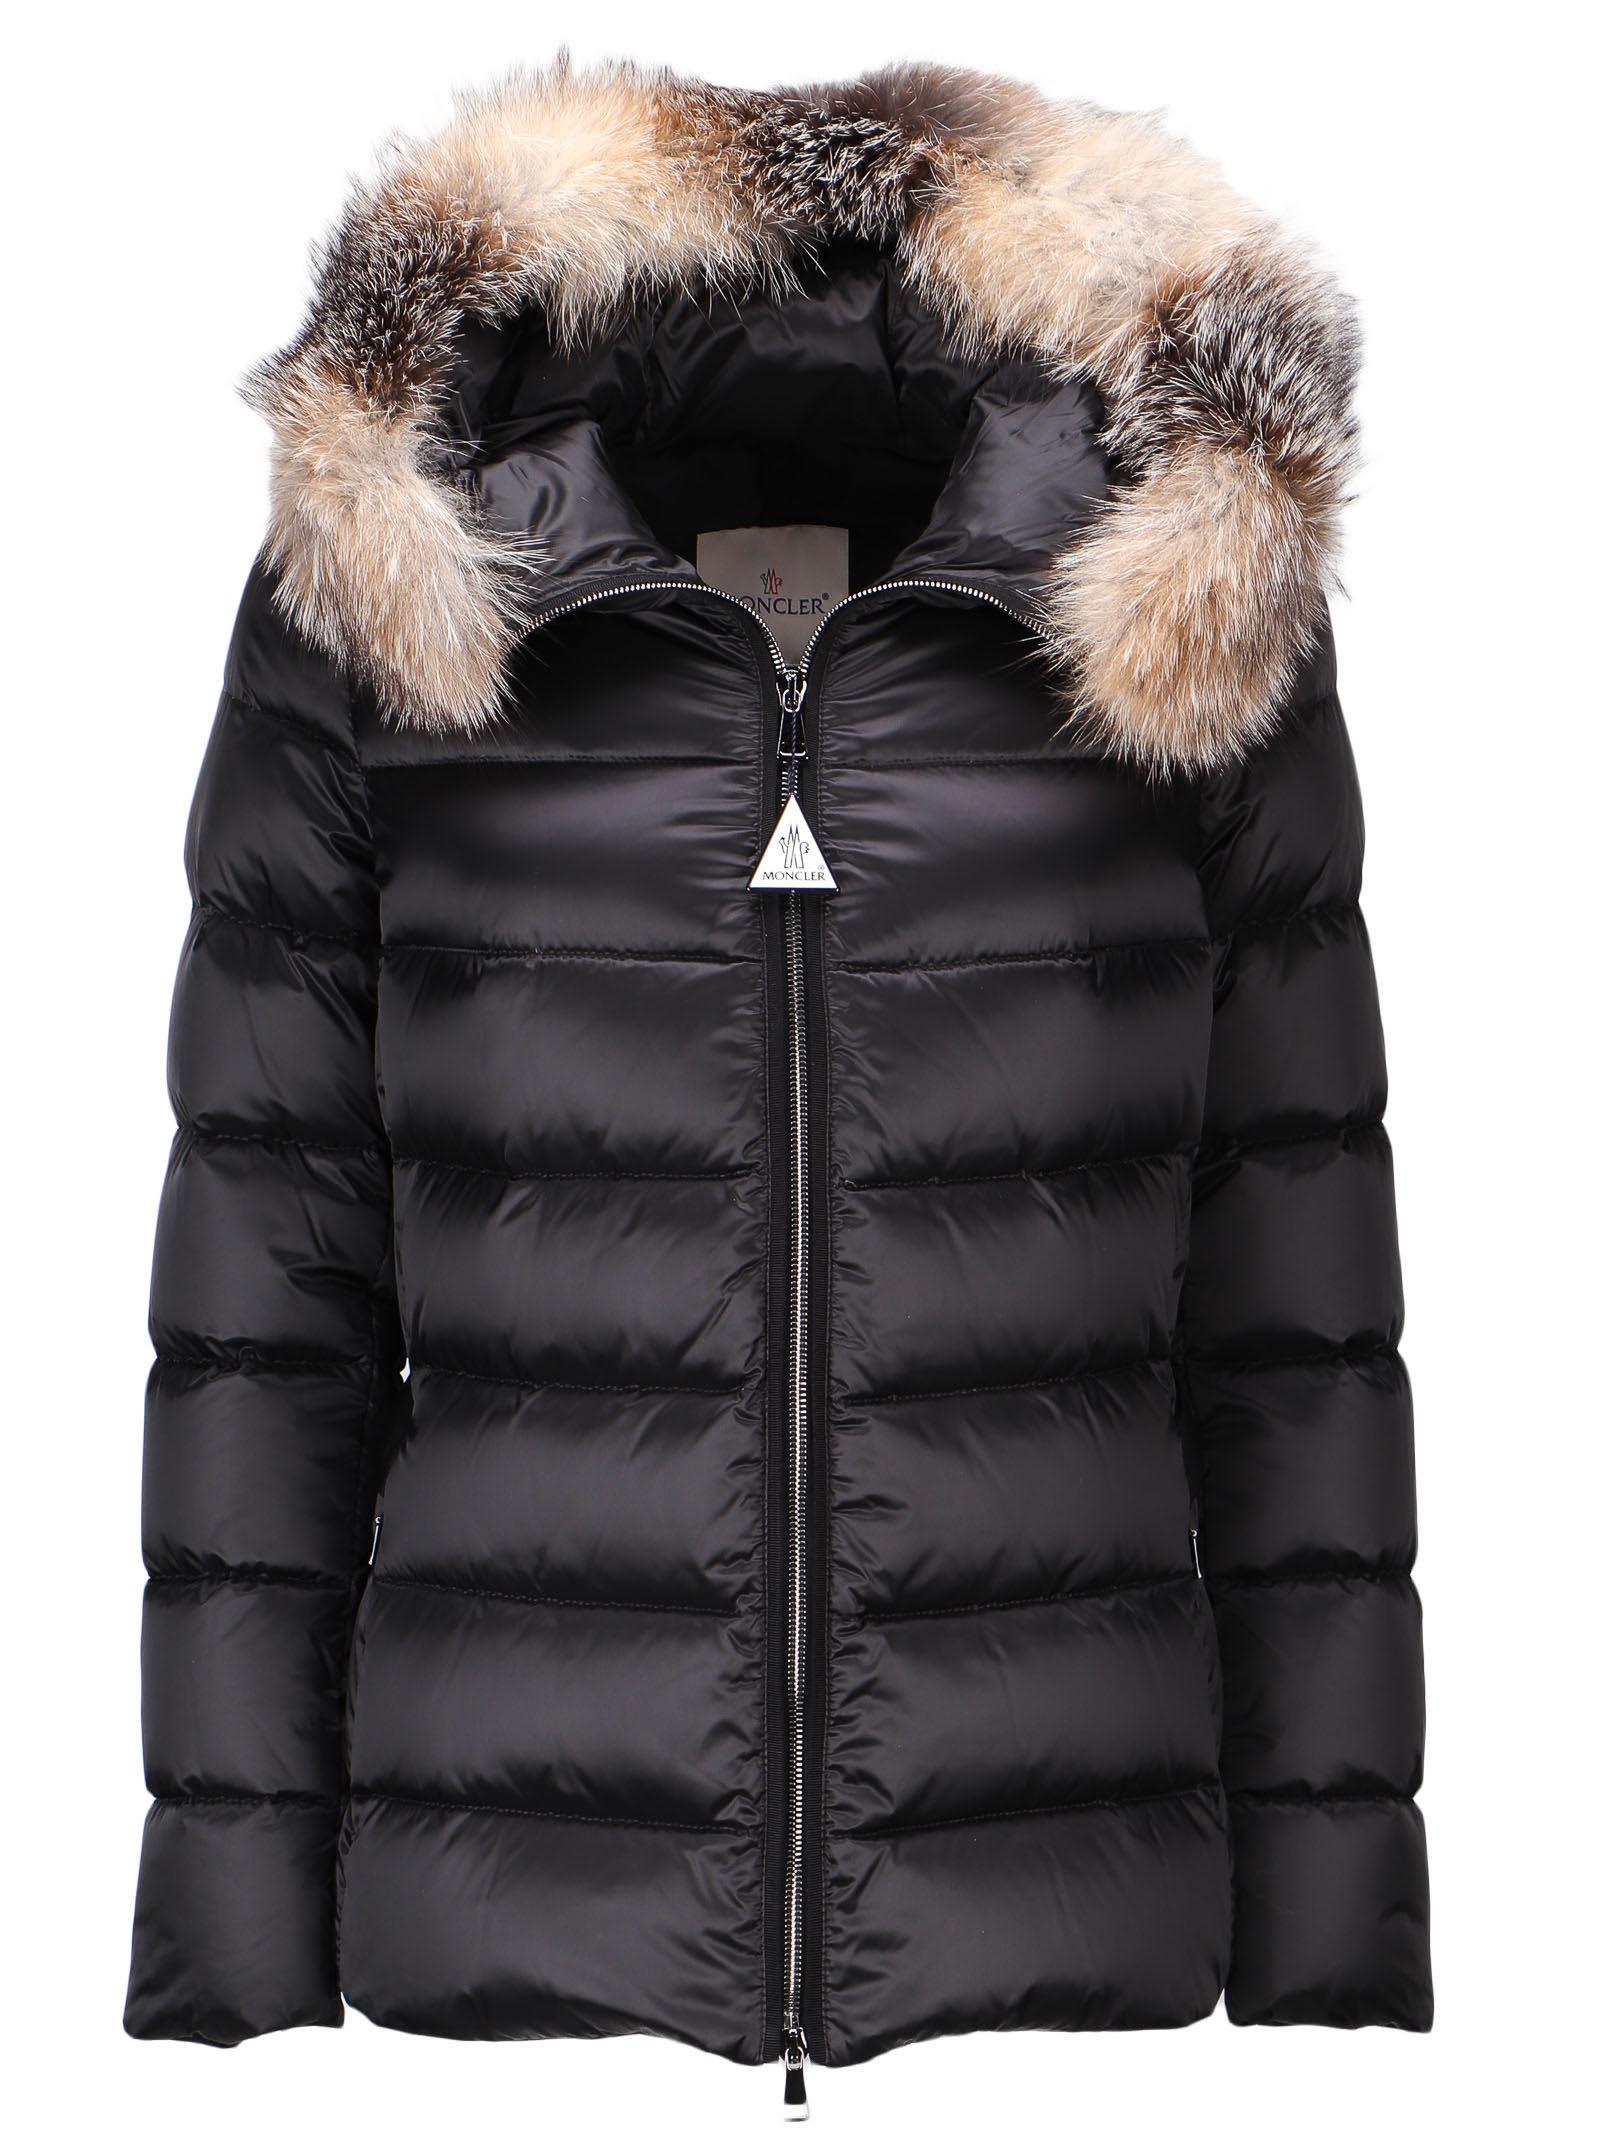 Photo of  Moncler Tati Jacket- shop Moncler jackets online sales